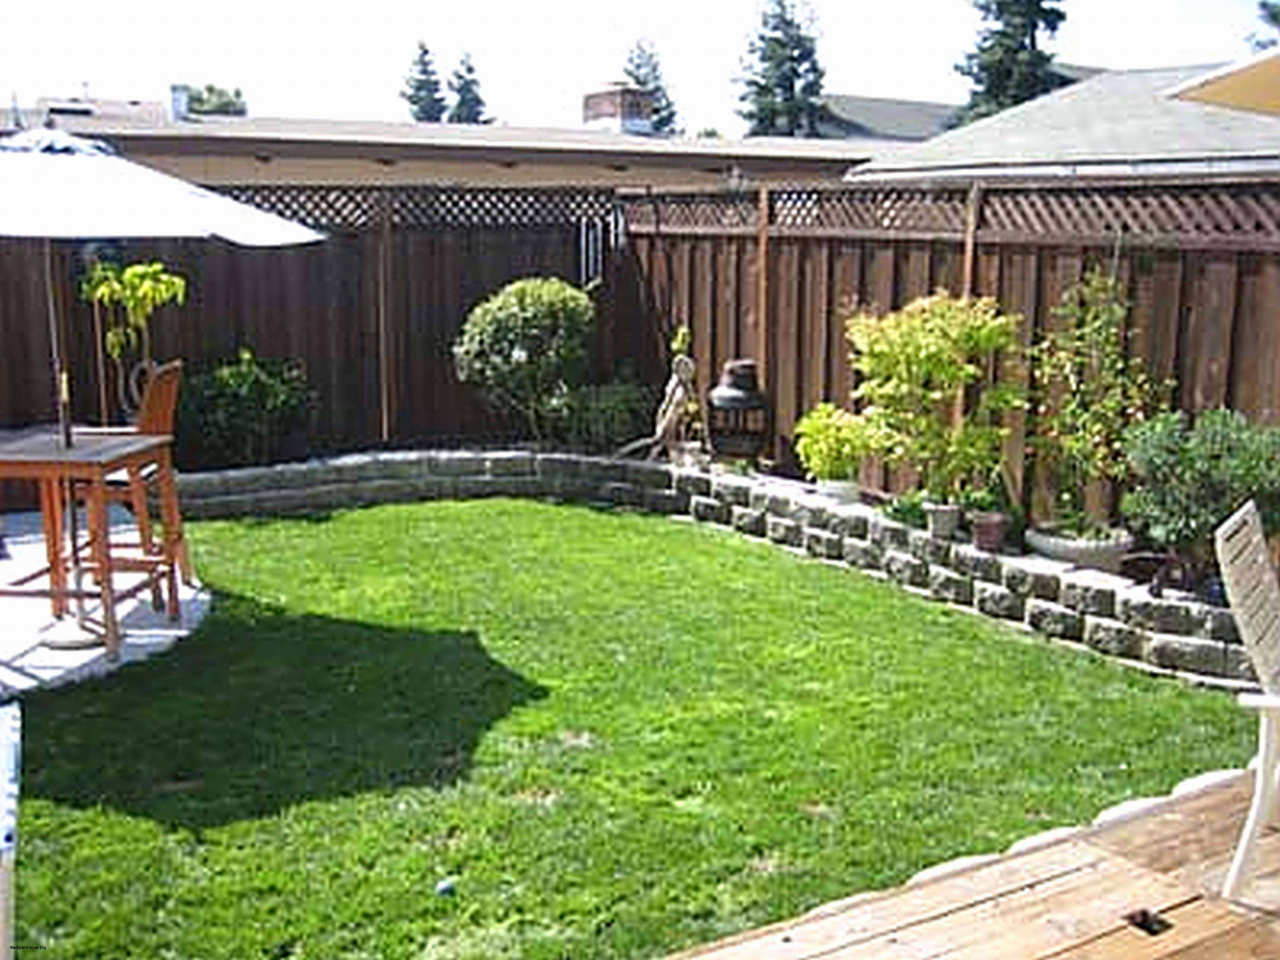 backyard patio ideas garten couch genial garden ideas lovely small patio ideas best durch backyard patio ideas